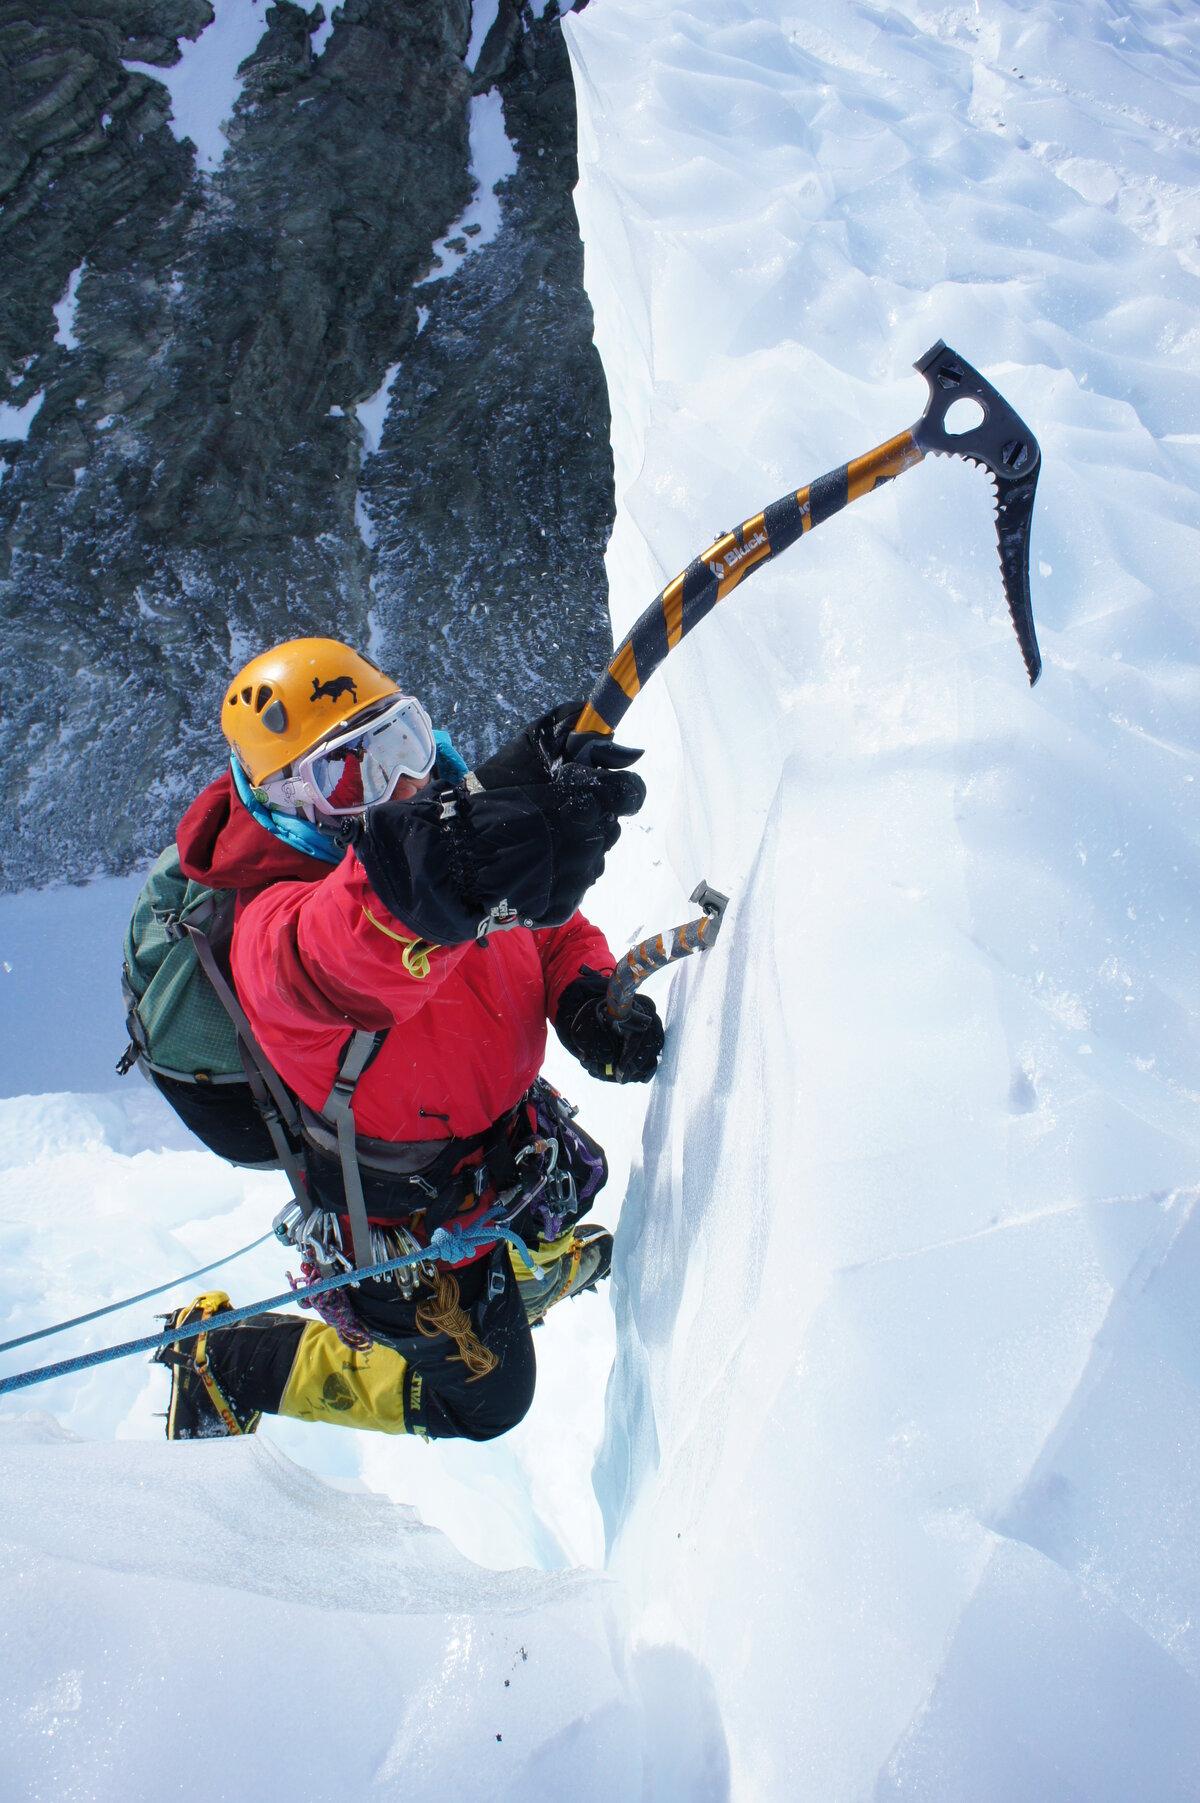 Vertical ice climbing at Charles Peak Windscoop